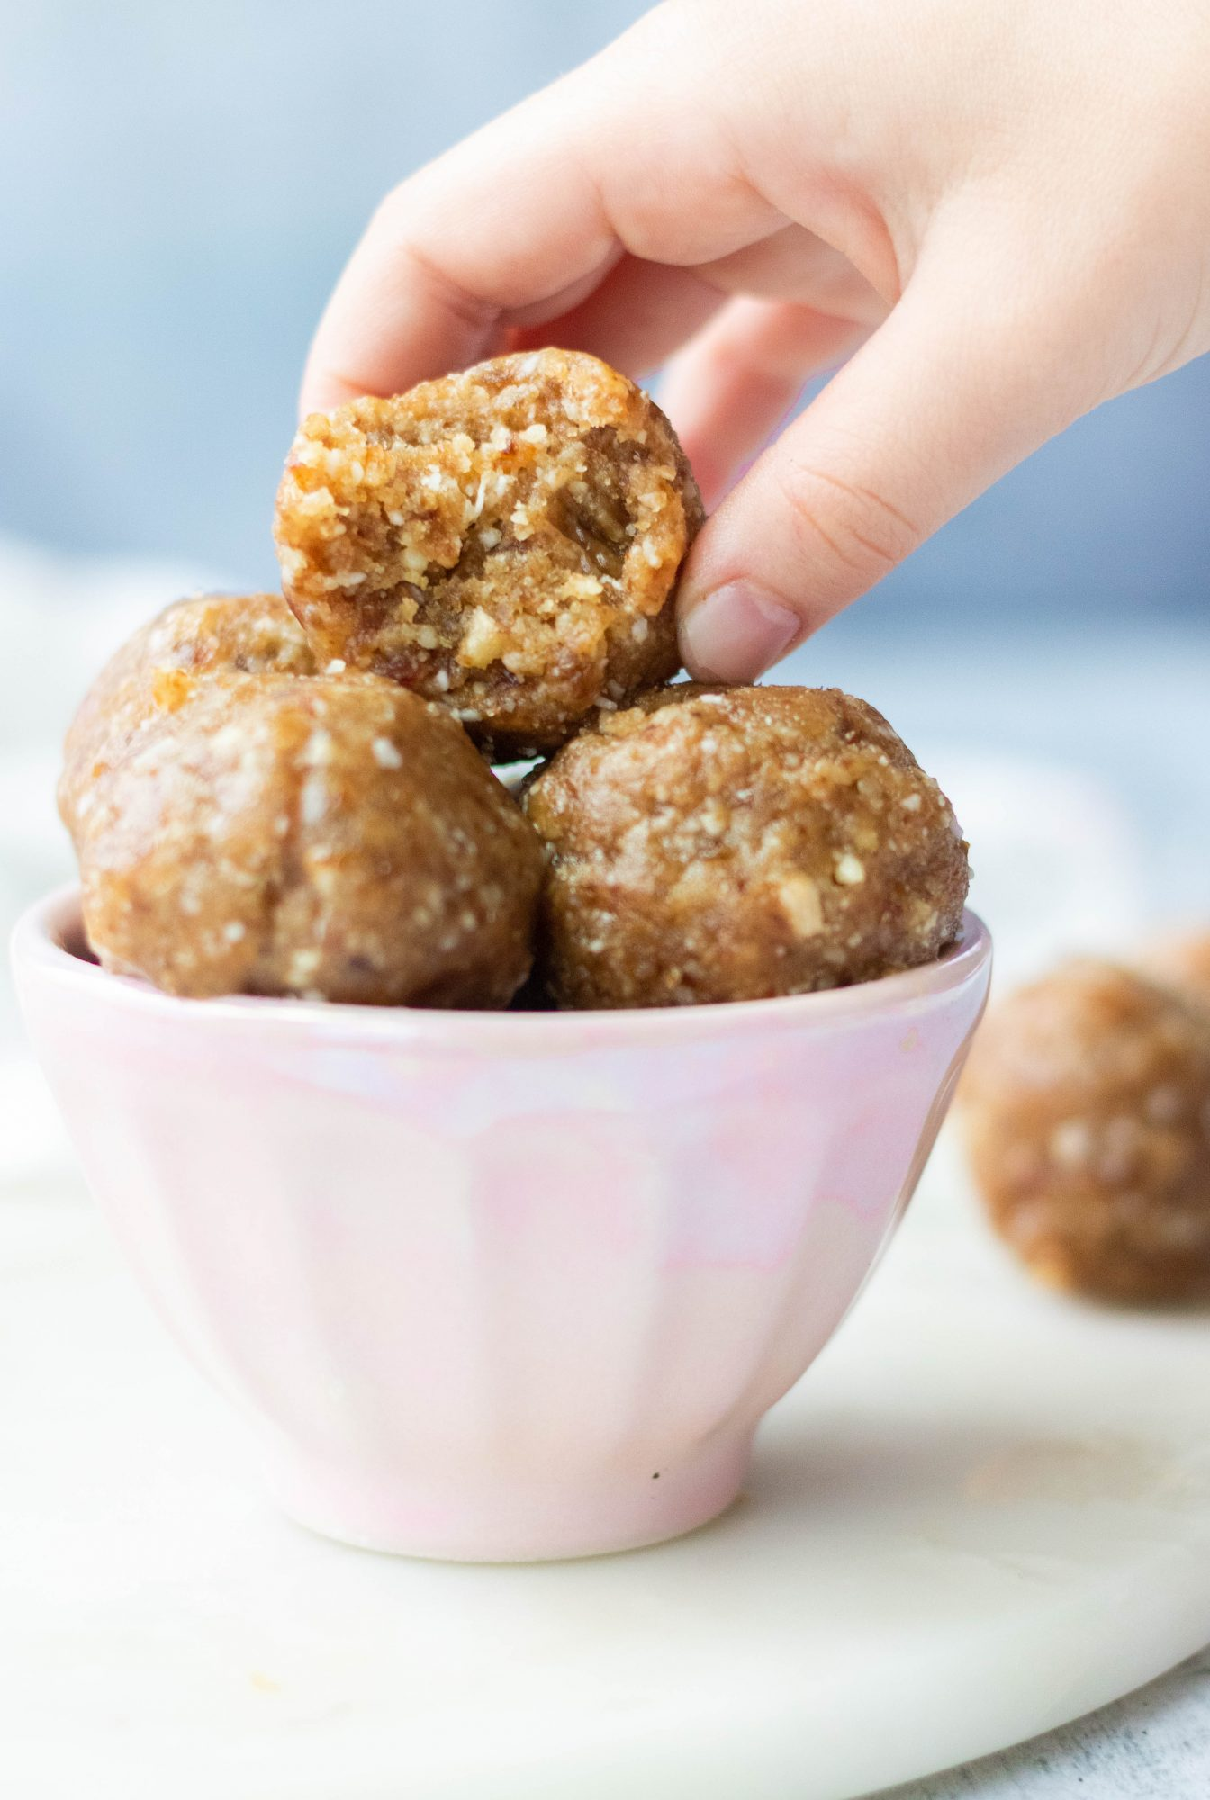 Easy No-Bake Date Energy Balls